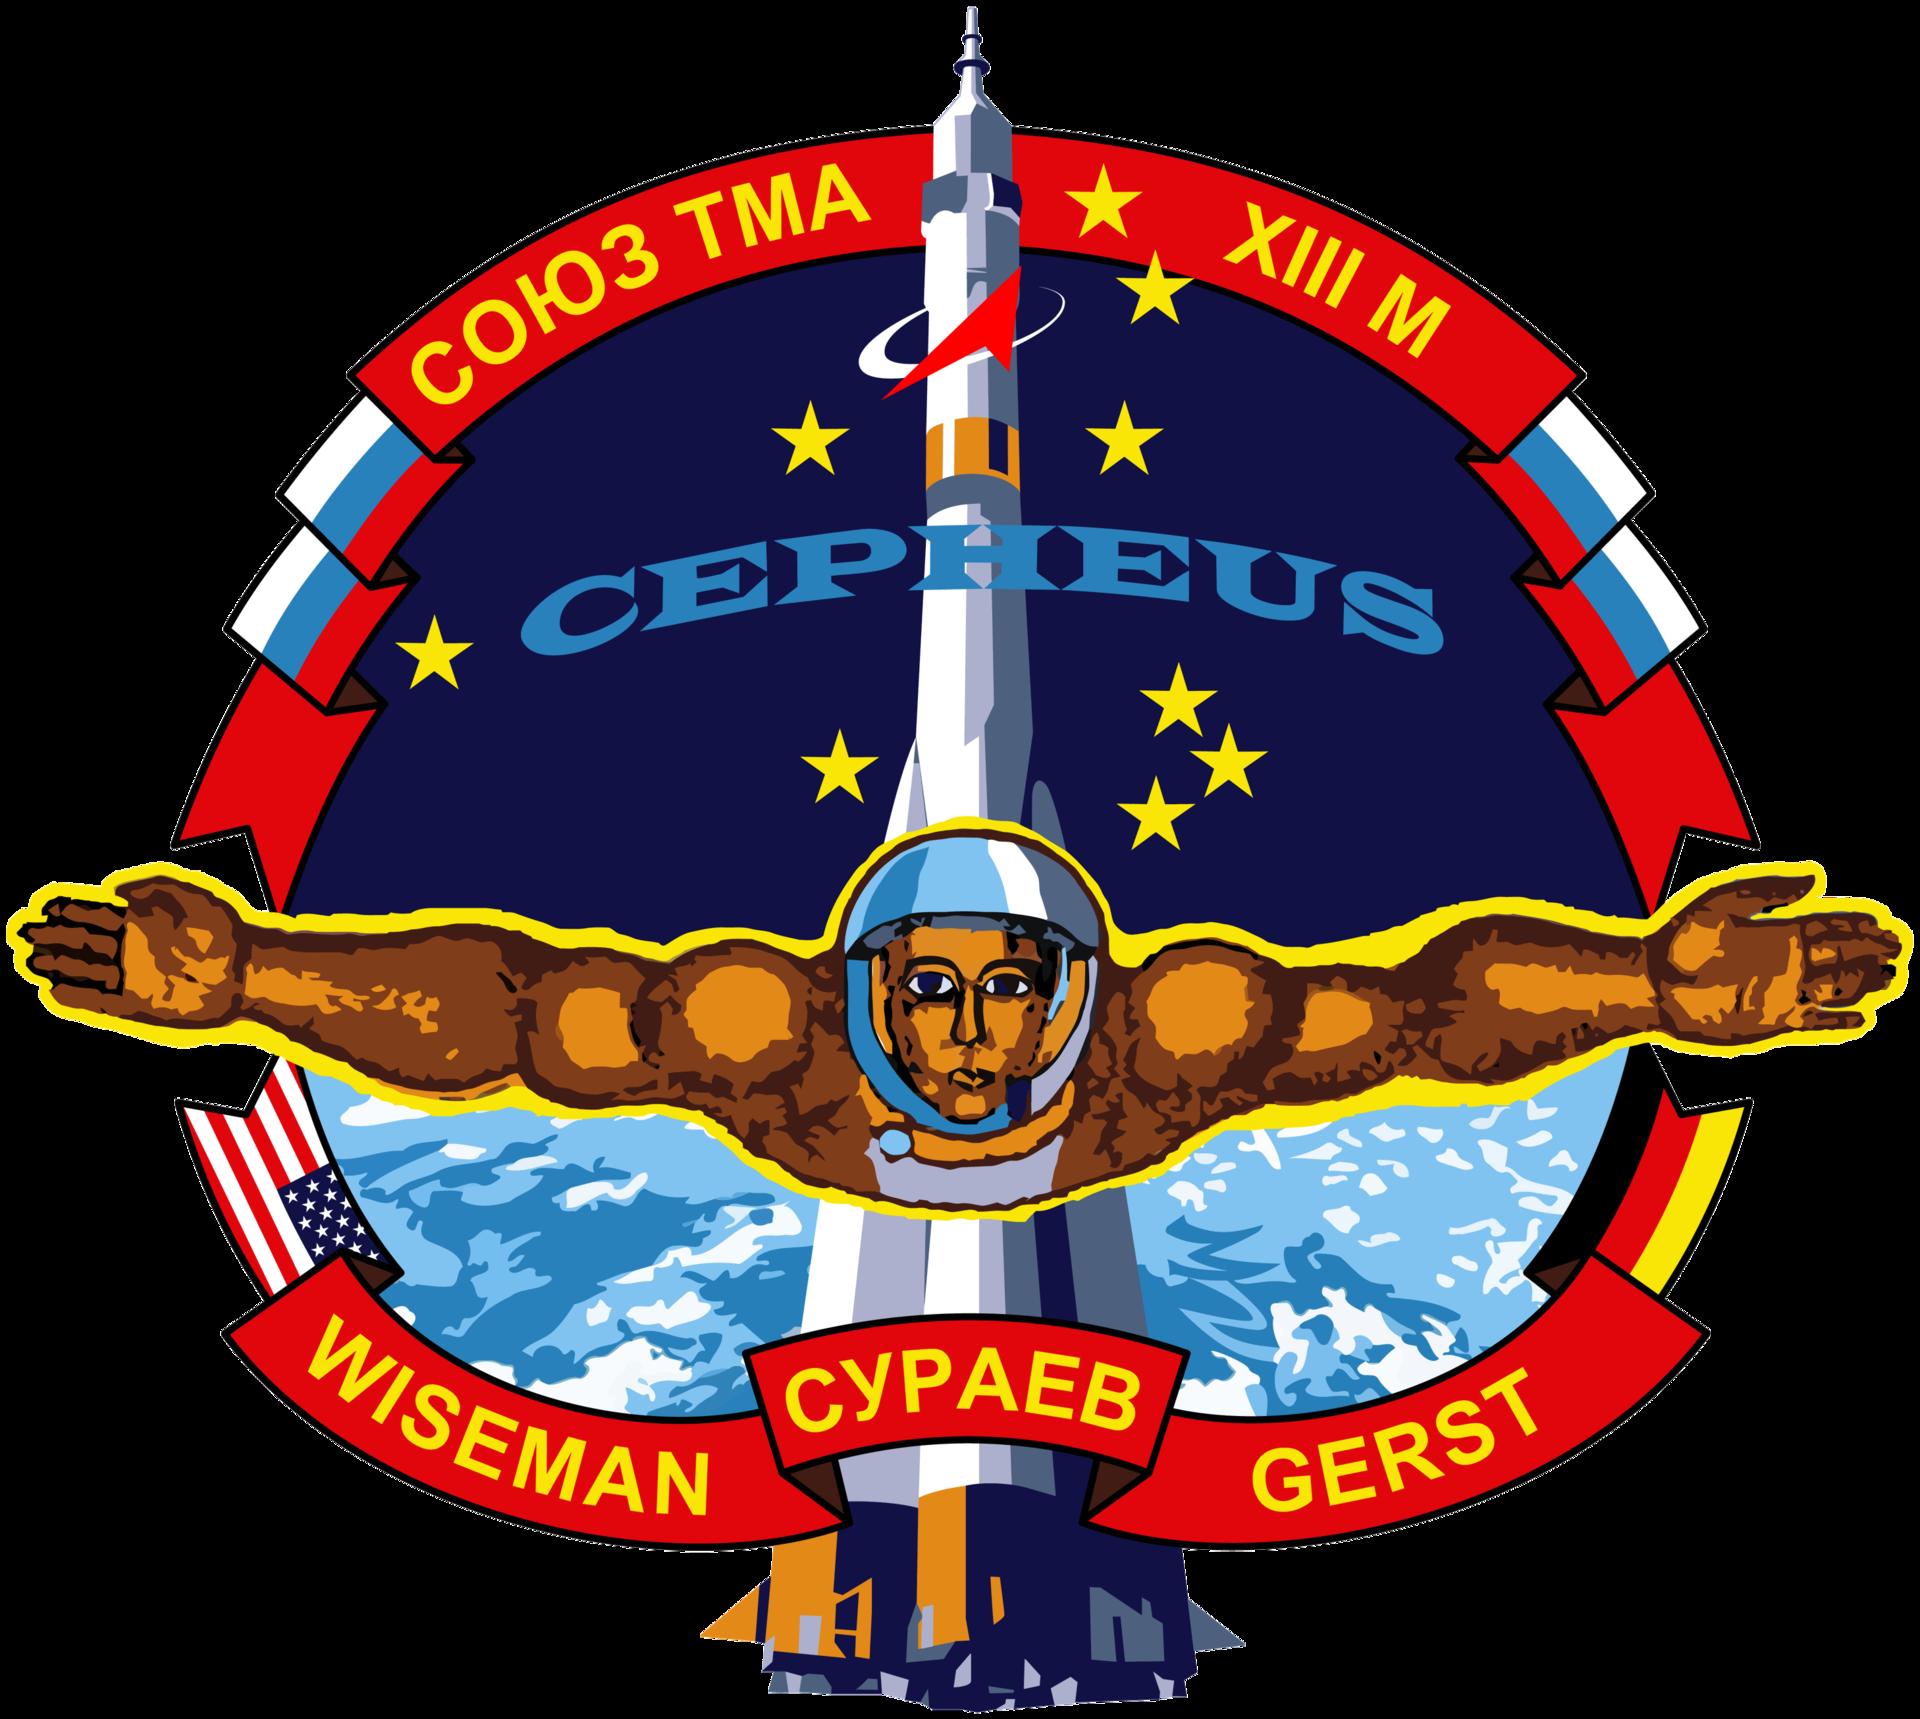 Sojuz TMA.